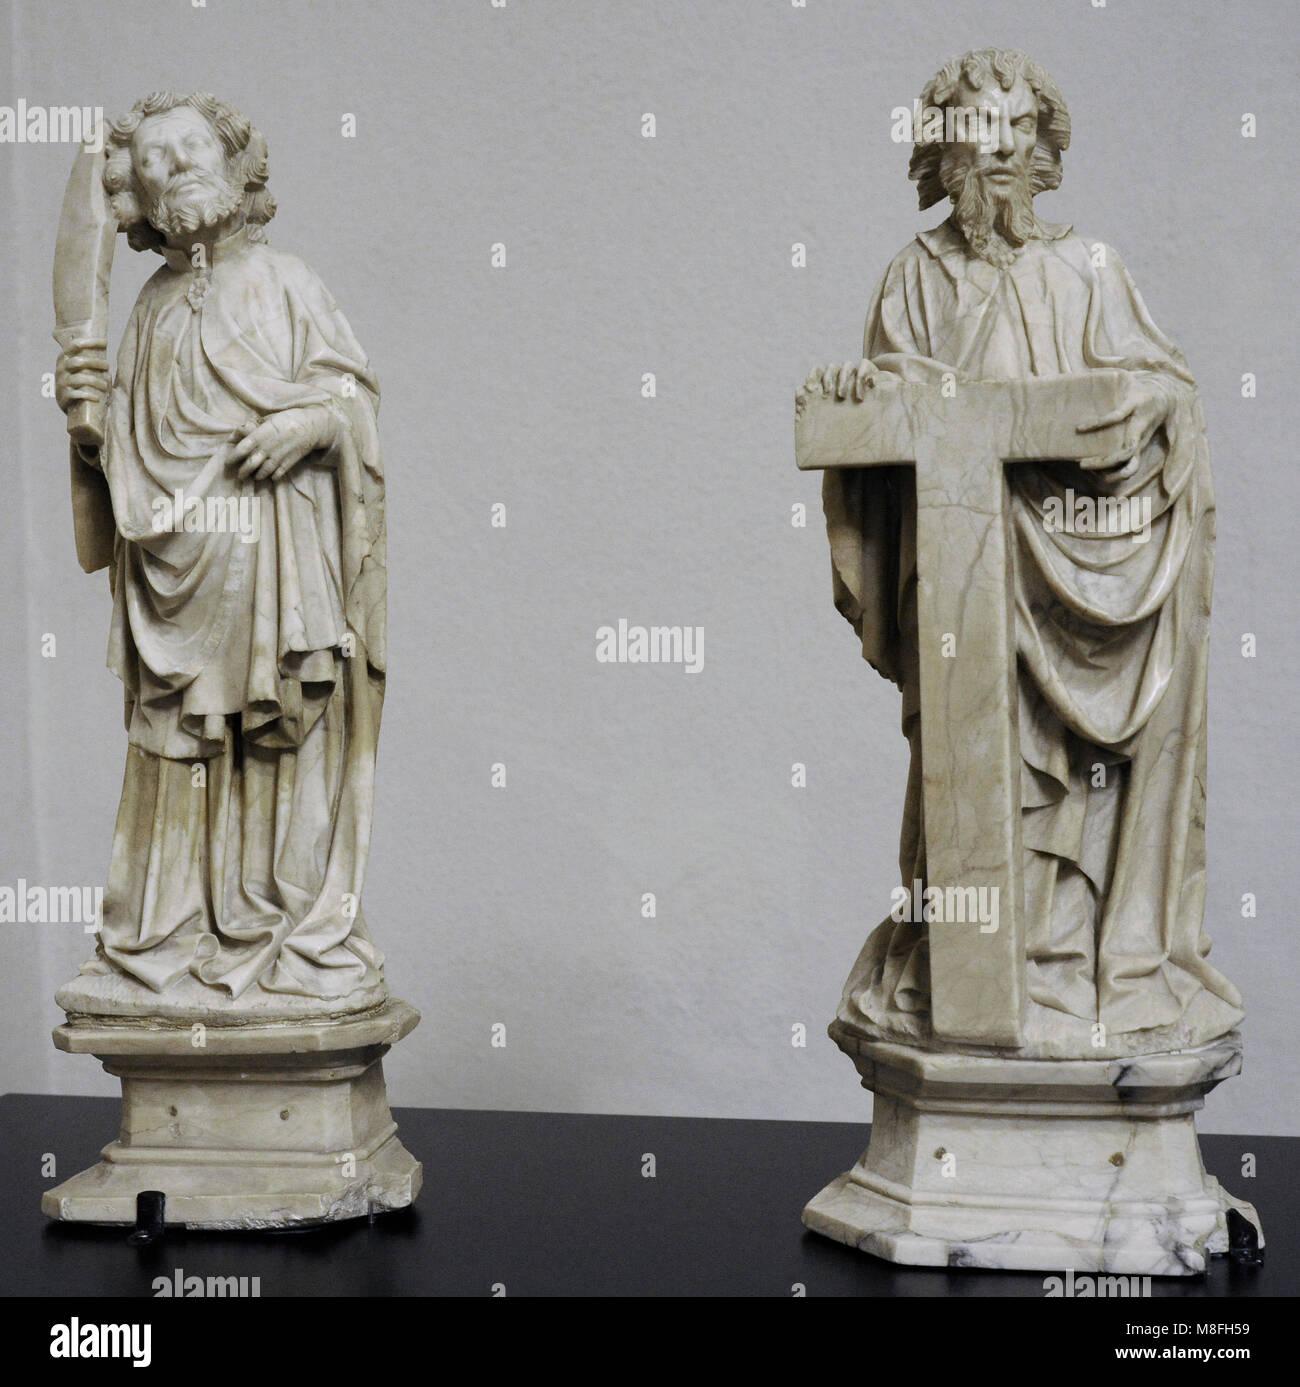 Saint Philip and Saint Bartholomew. Master of the Rimini Altar, c. 1420. Southern Netherlands. Alabaster. Schnütgen - Stock Image